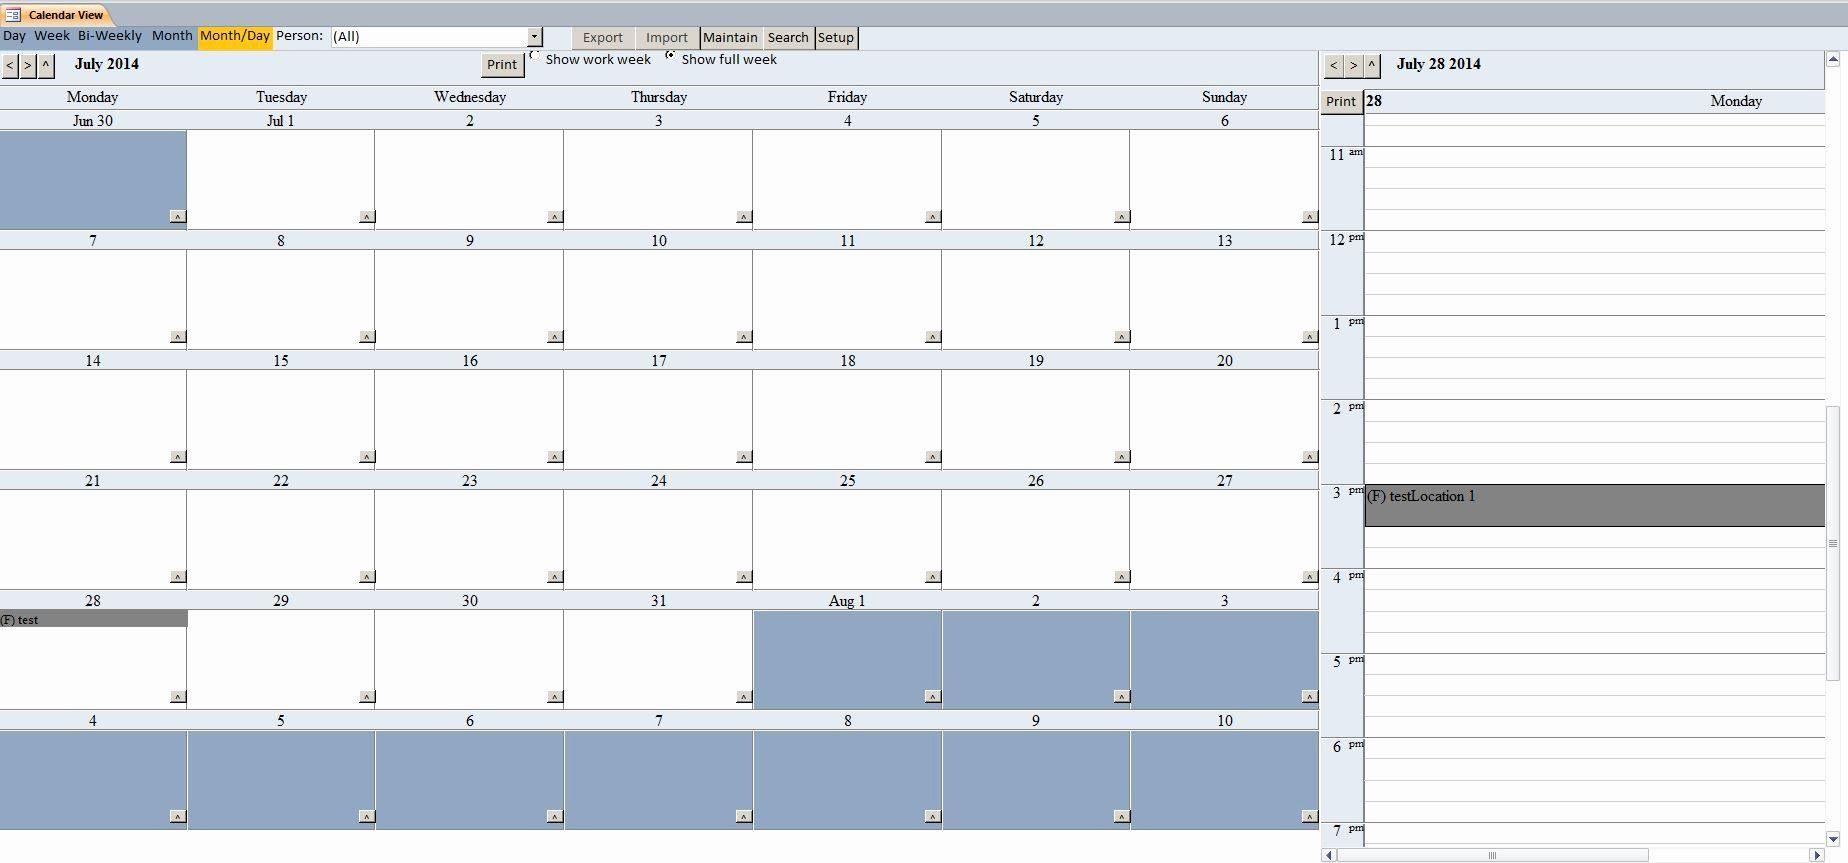 Microsoft Access Schedule Template Inspirational Enhanced Calendar Scheduling Database Template Schedule Template Student Schedule Templates